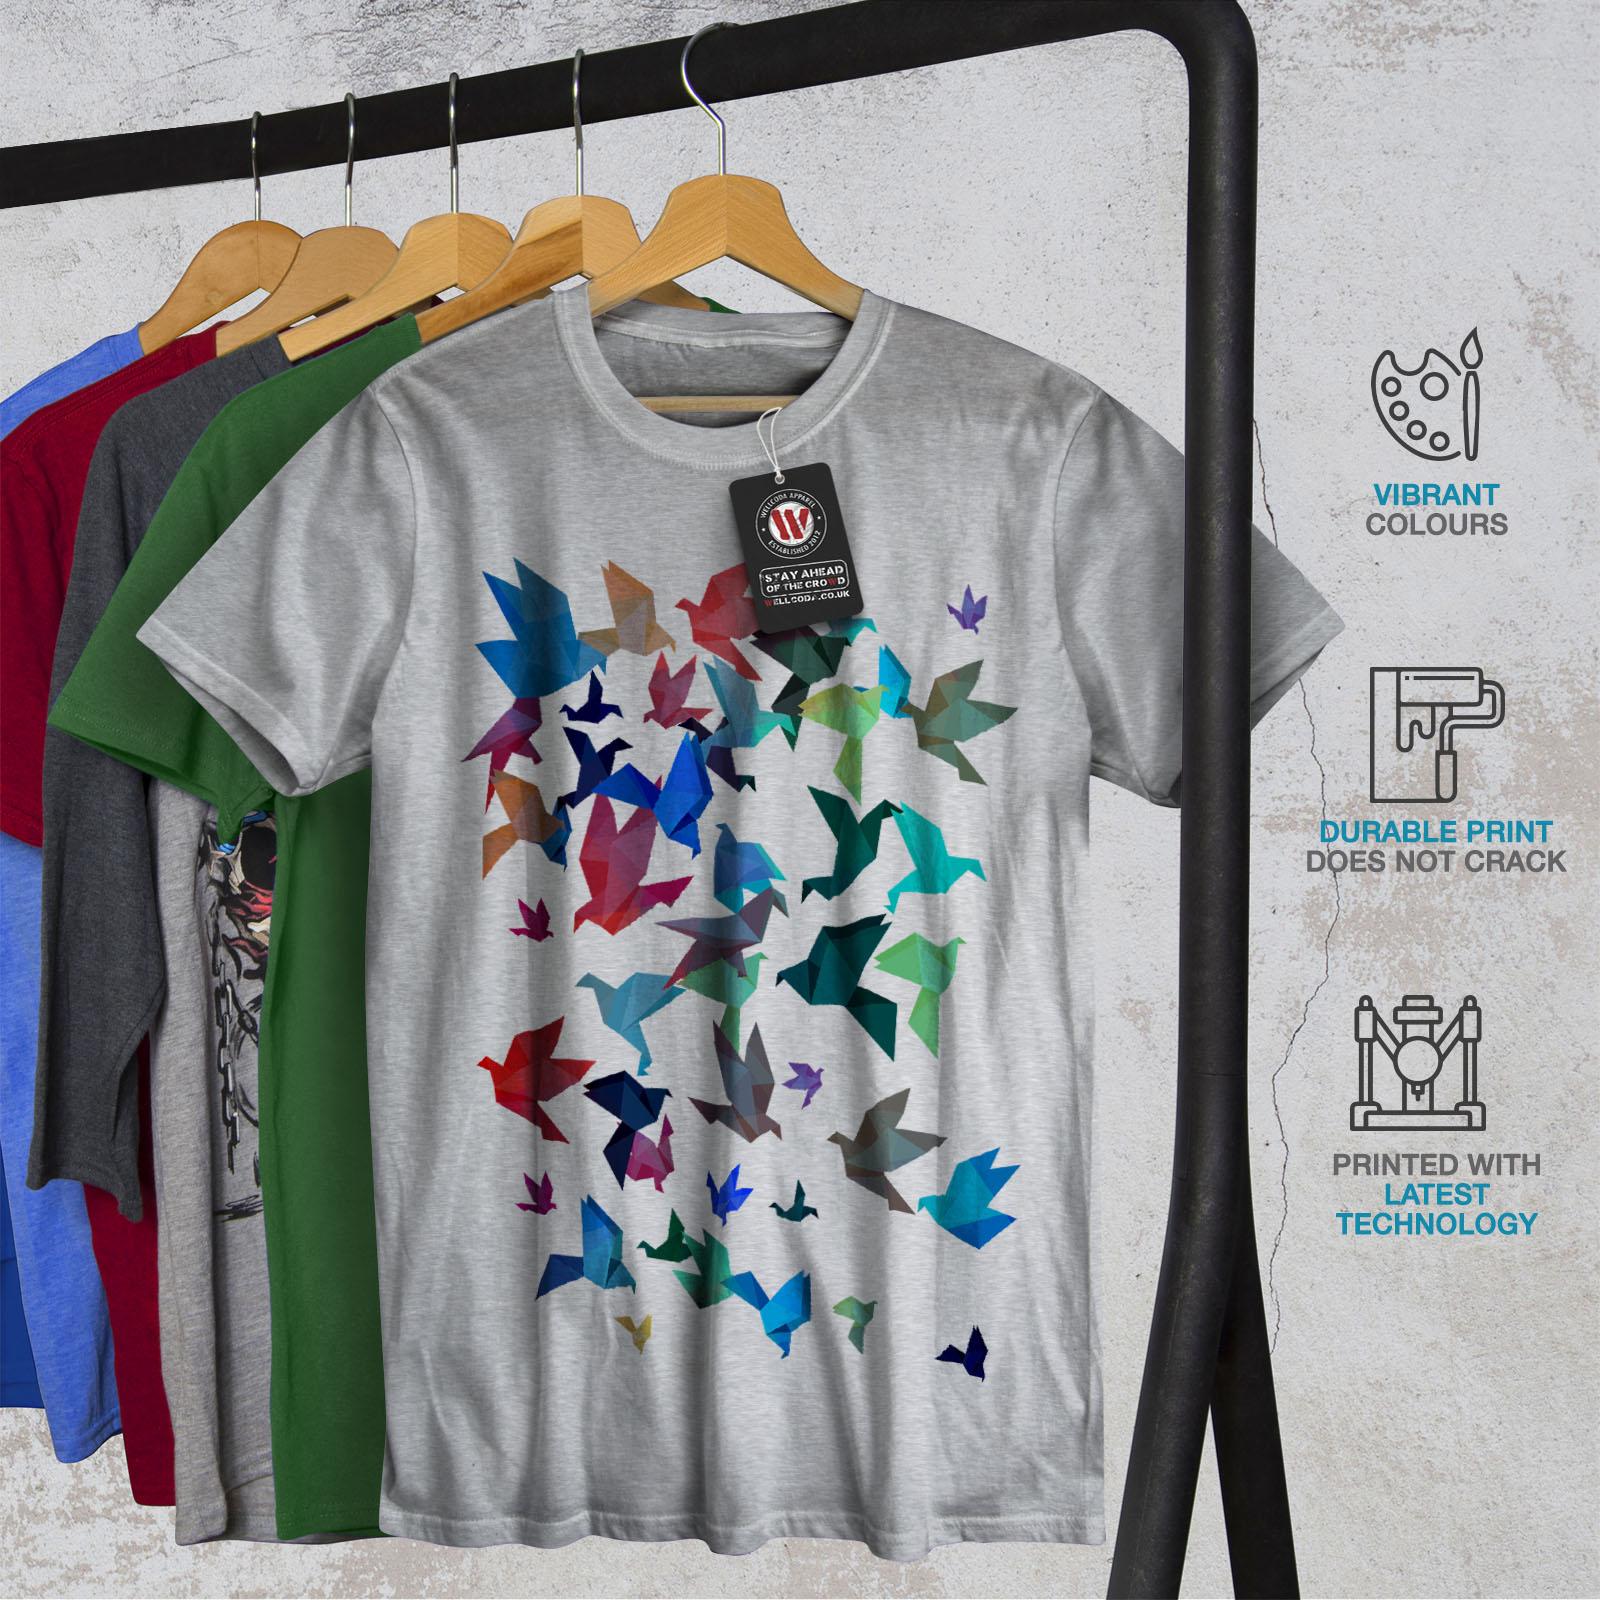 Wellcoda-Origami-Bird-Colors-Mens-T-shirt-Craft-Graphic-Design-Printed-Tee thumbnail 18